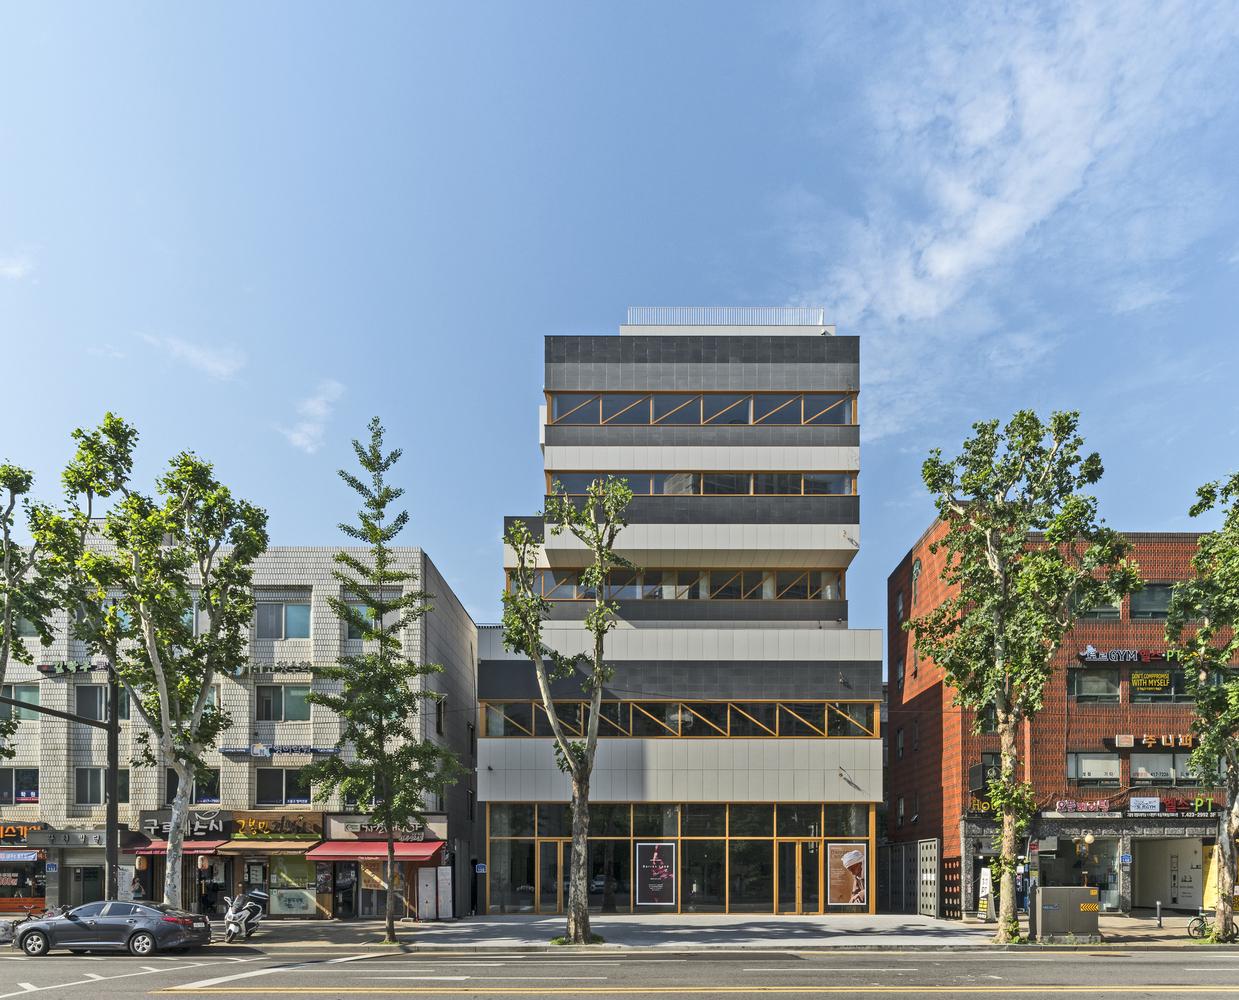 Fineman & Krassen Headquarters / JYA-RCHITECTS